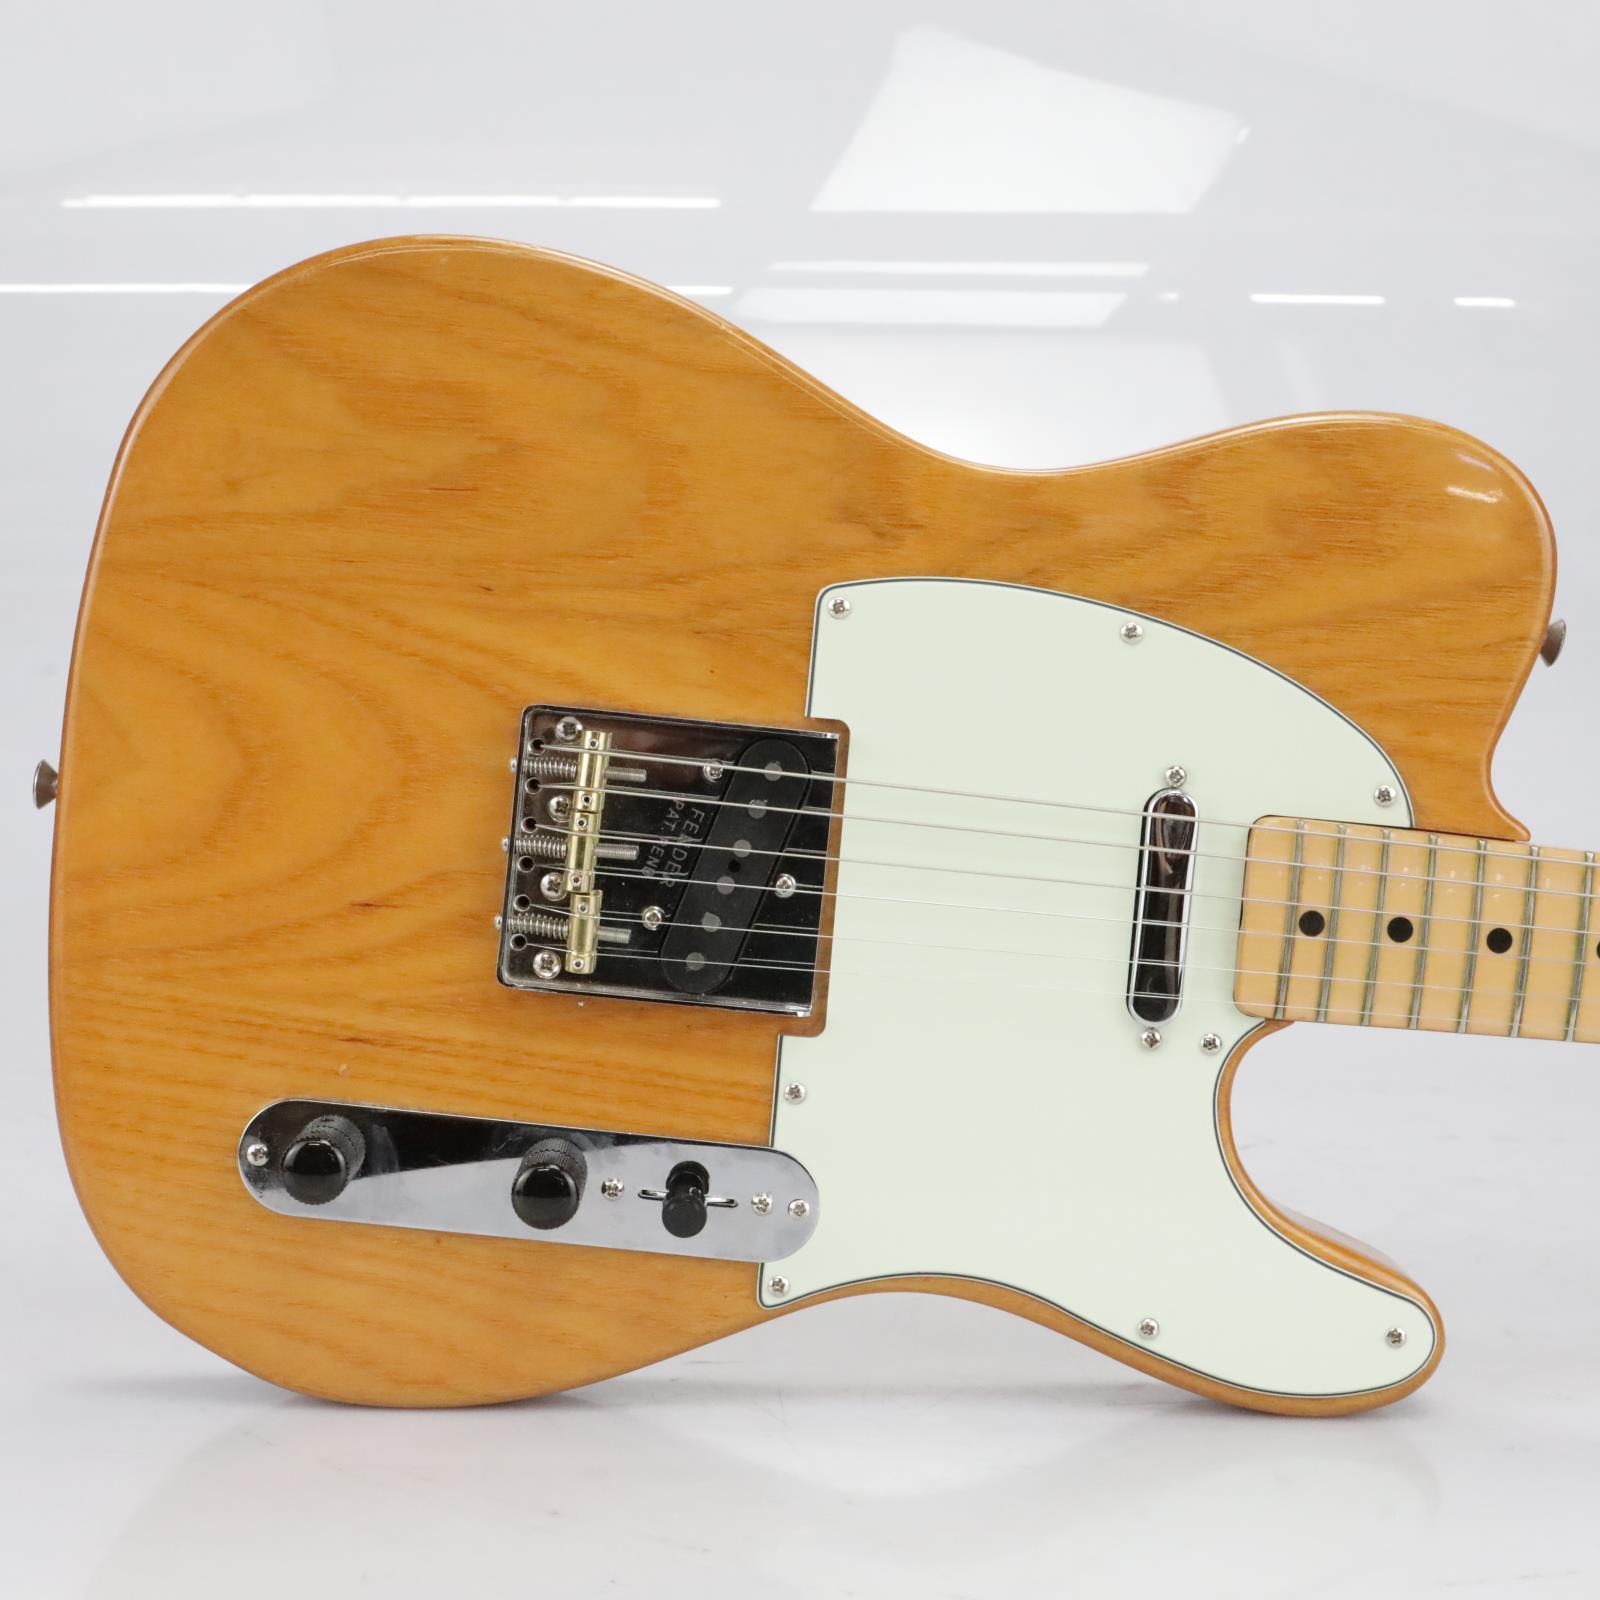 1978 Fender Telecaster Tele Electric Guitar Butterscotch W/ Tweed Case #40188